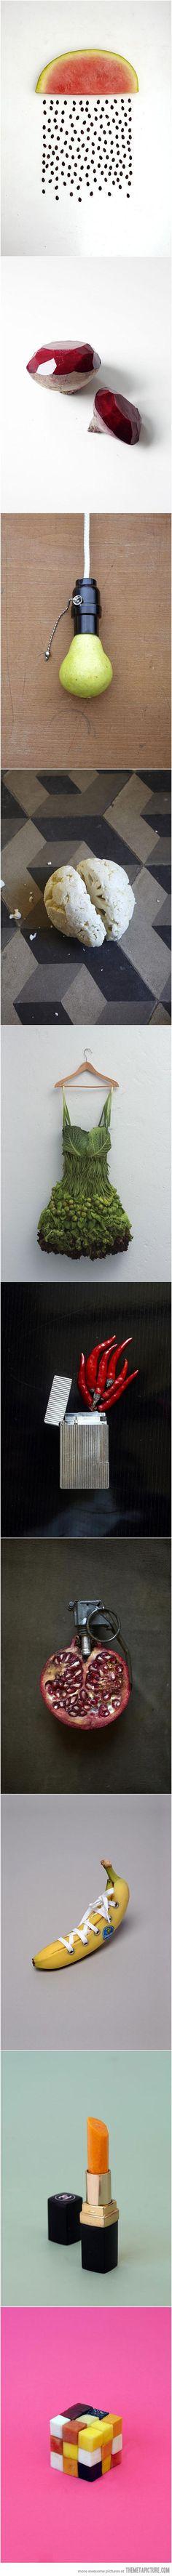 Creative food art… I am LOVING these! #autism #aspergers